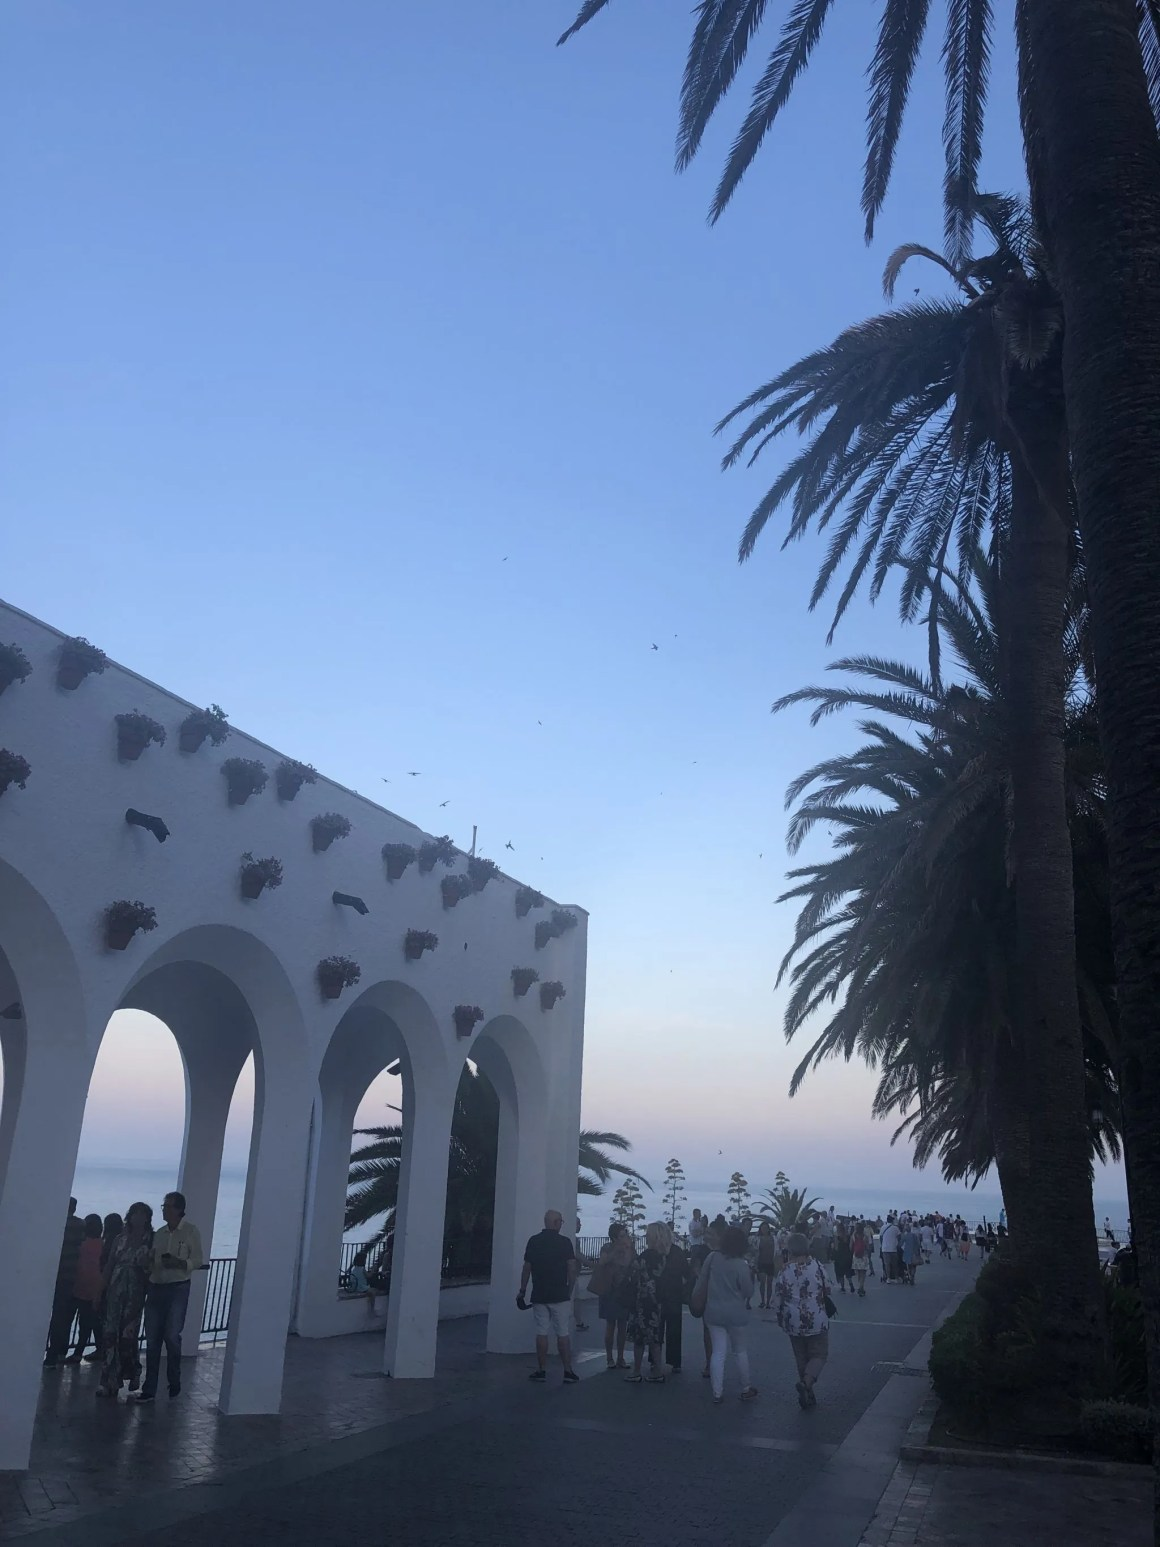 Nerja arches at dusk